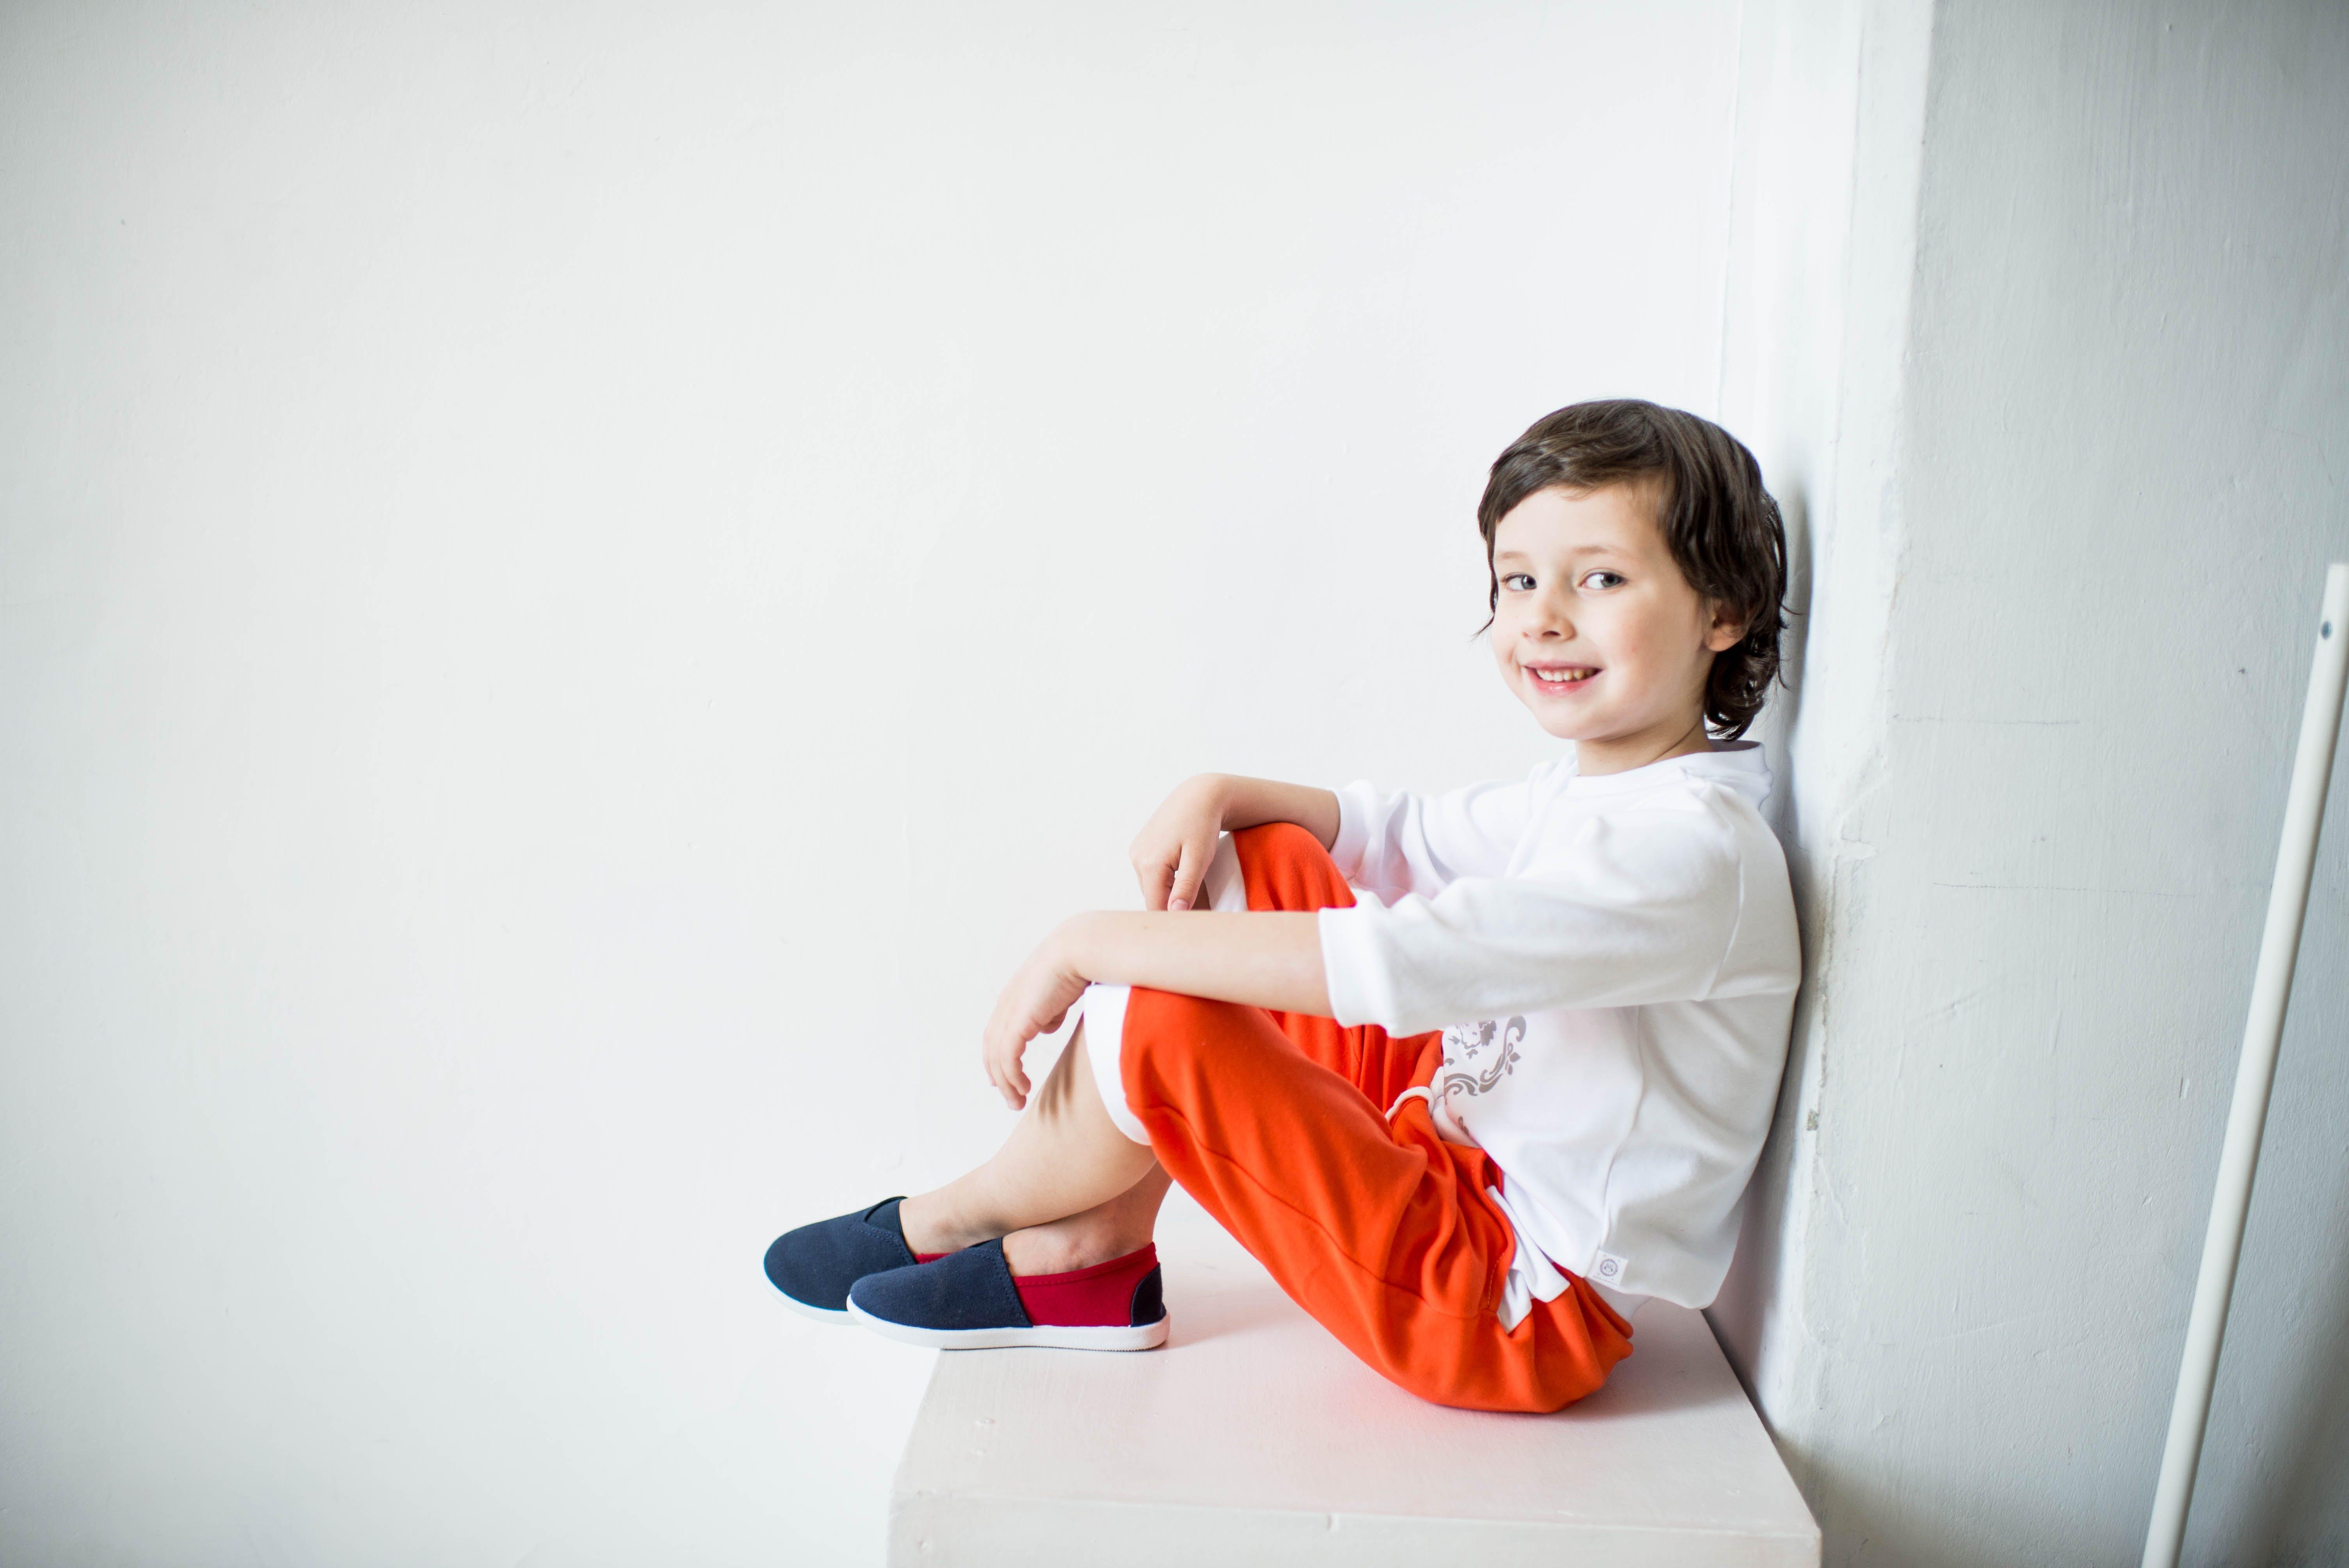 Smiling Boy Wearing White Shirt Leaning on Wall